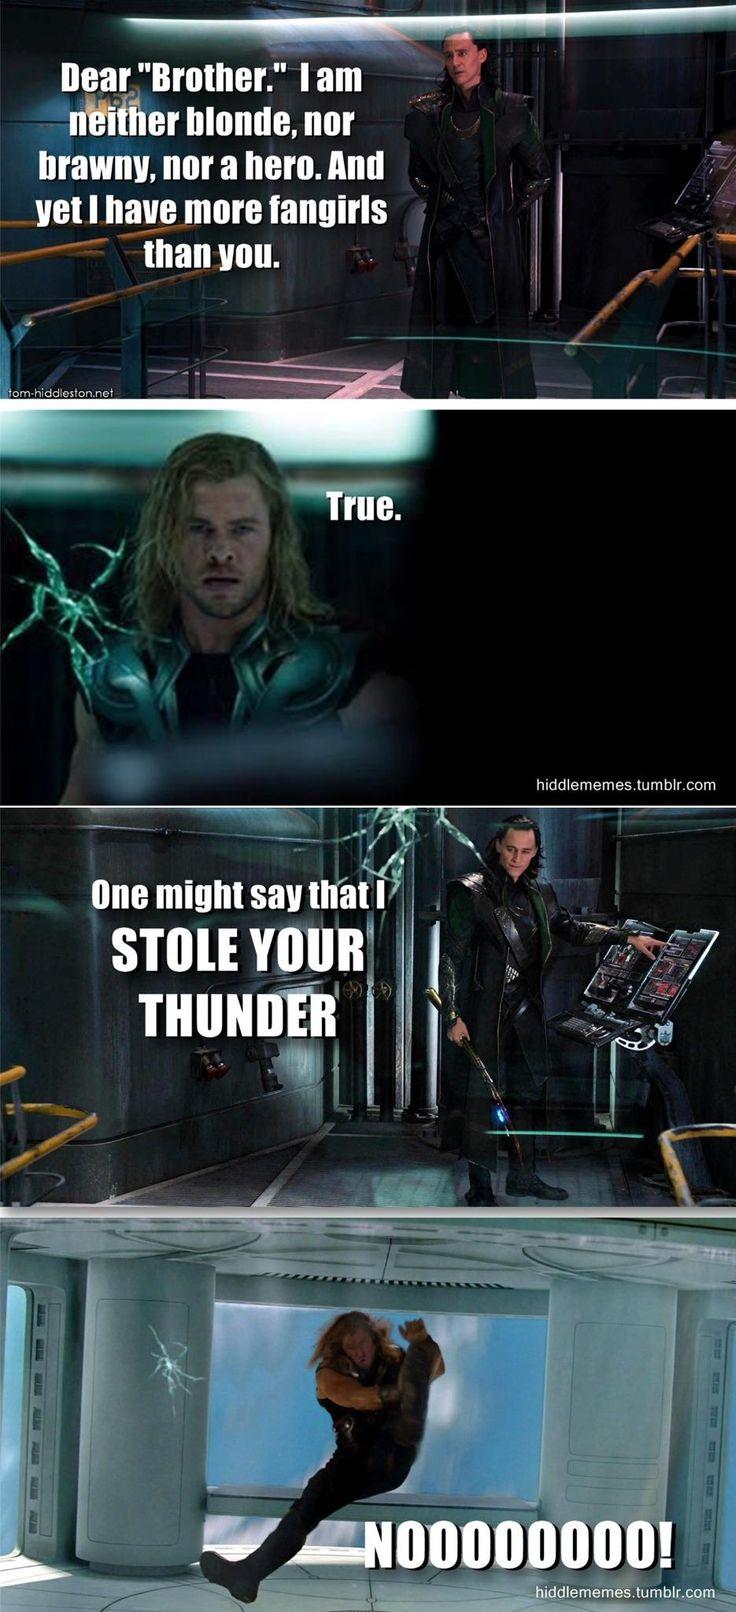 loki meme | OhLoki : RT @HiddleMemes: #TomHiddleston #Loki meme. #Avengers DVD ...